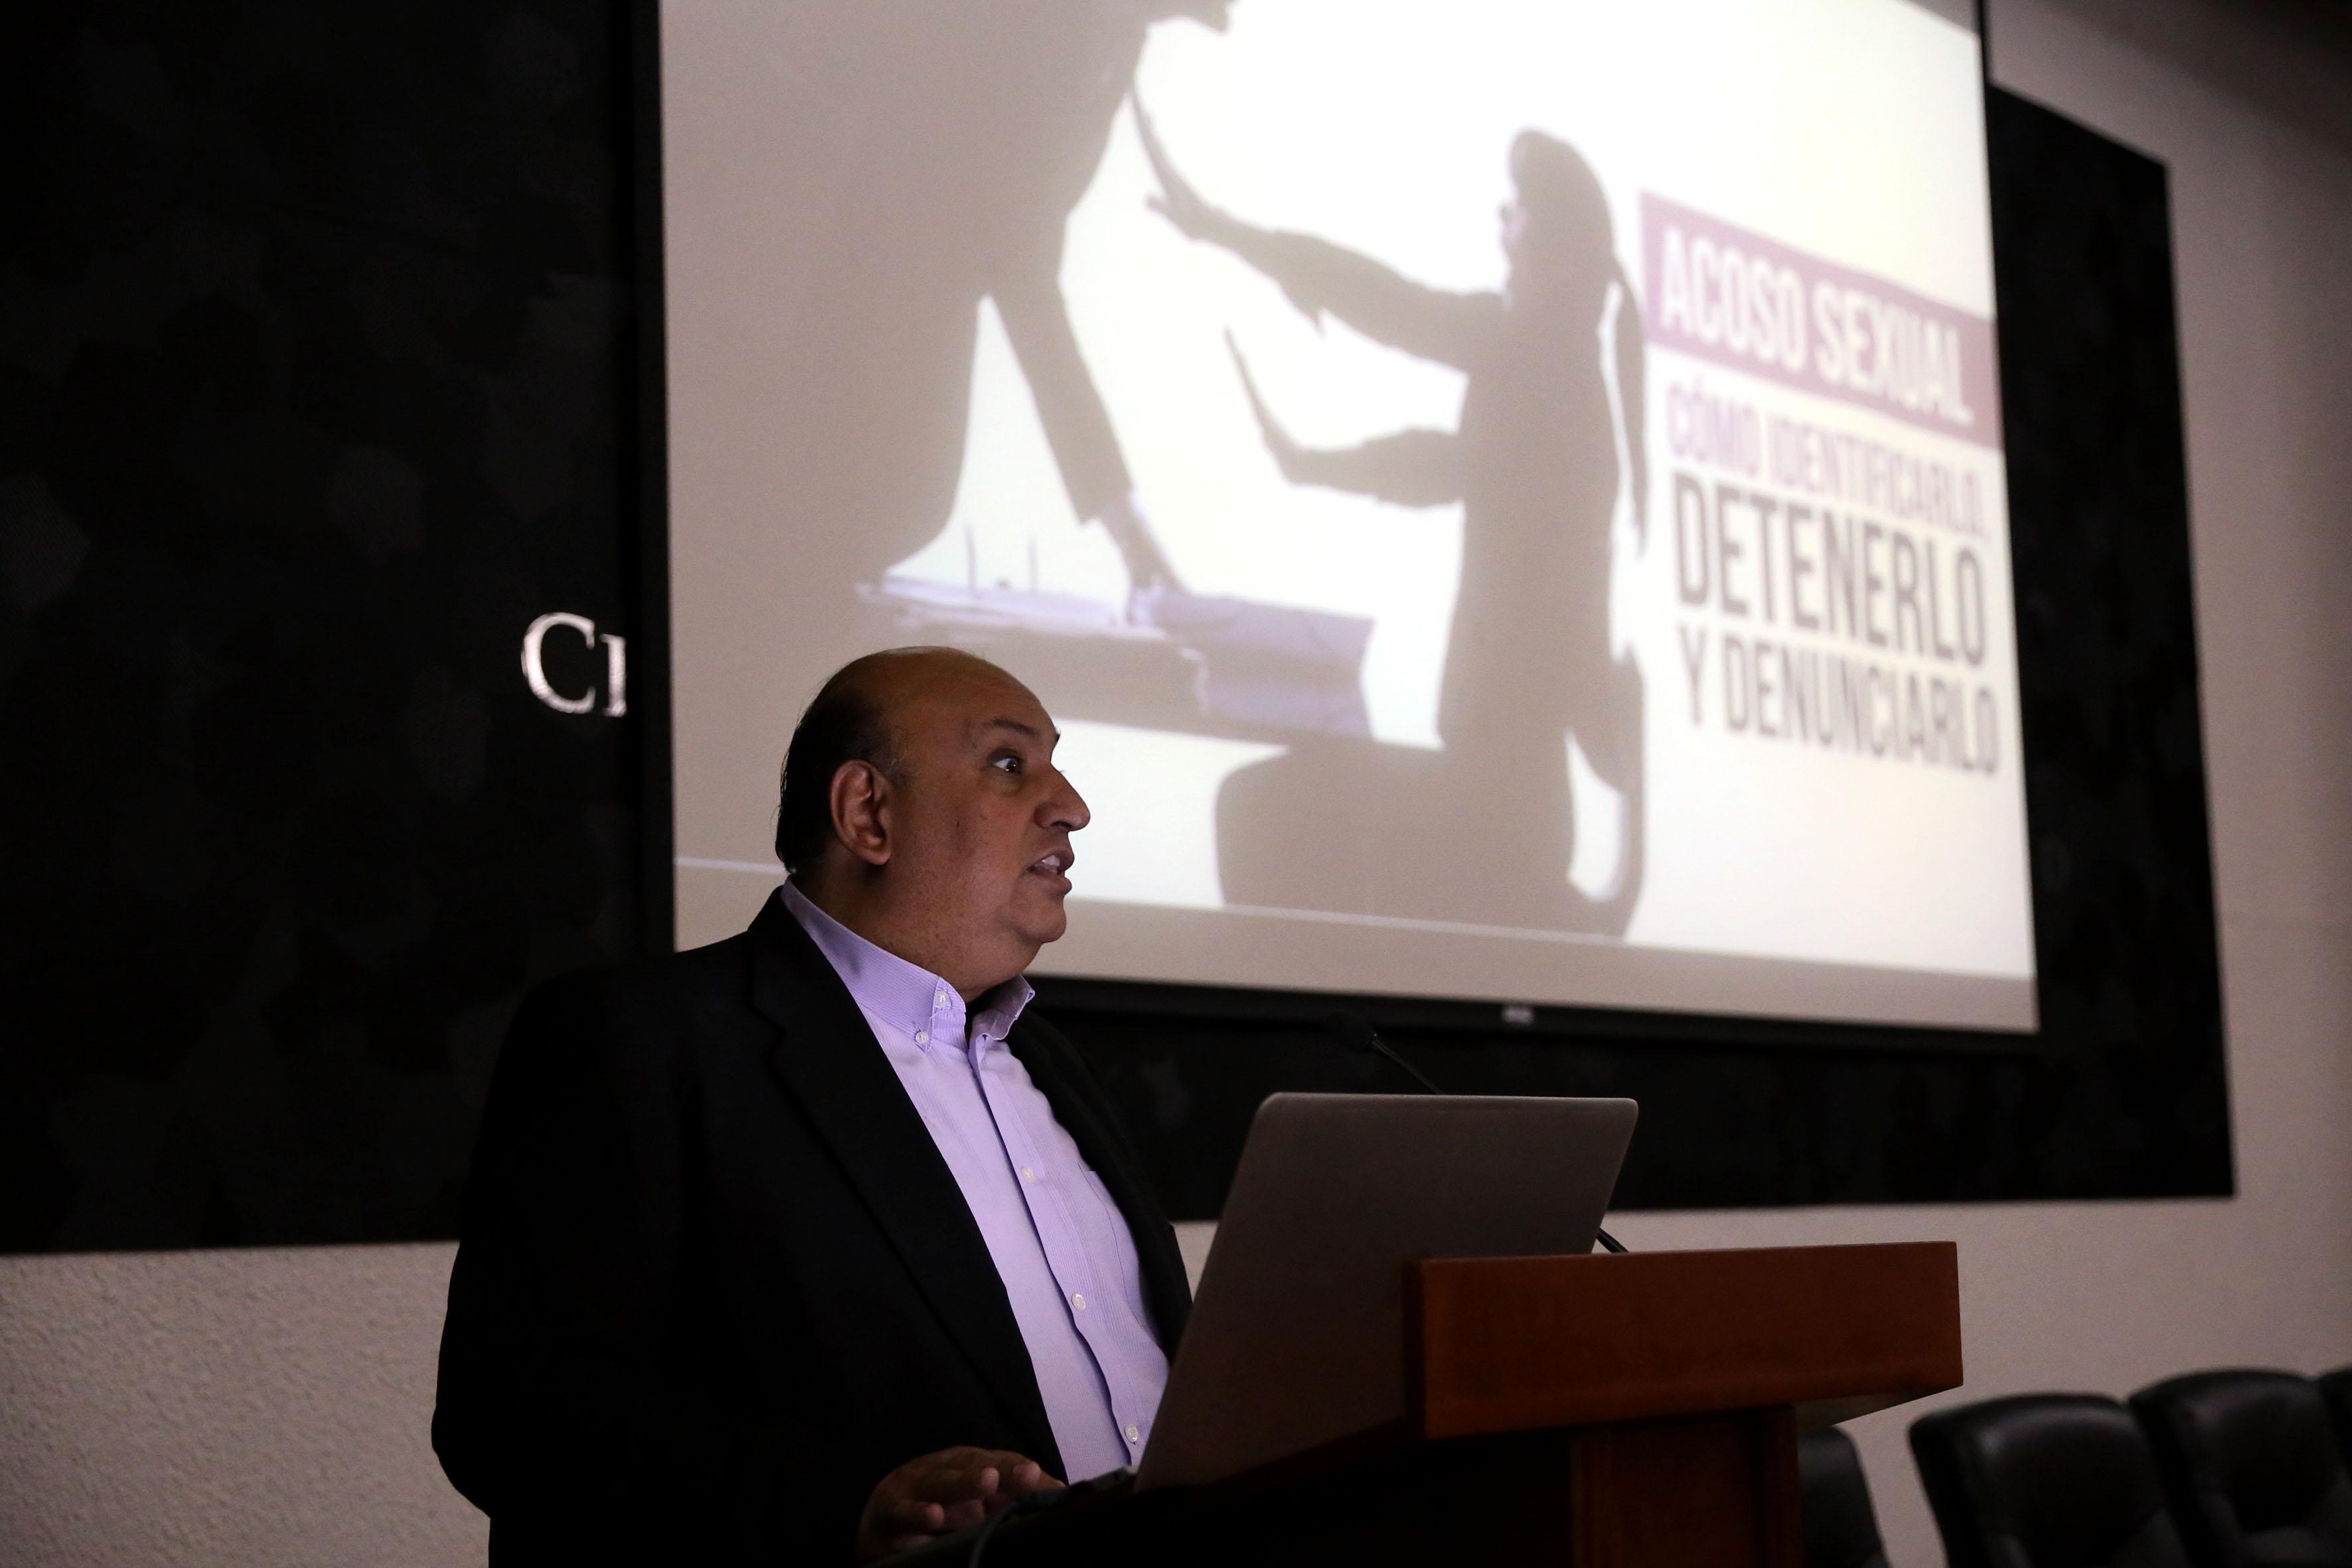 Mtro. Francisco Gutérrez impartiendo conferencia